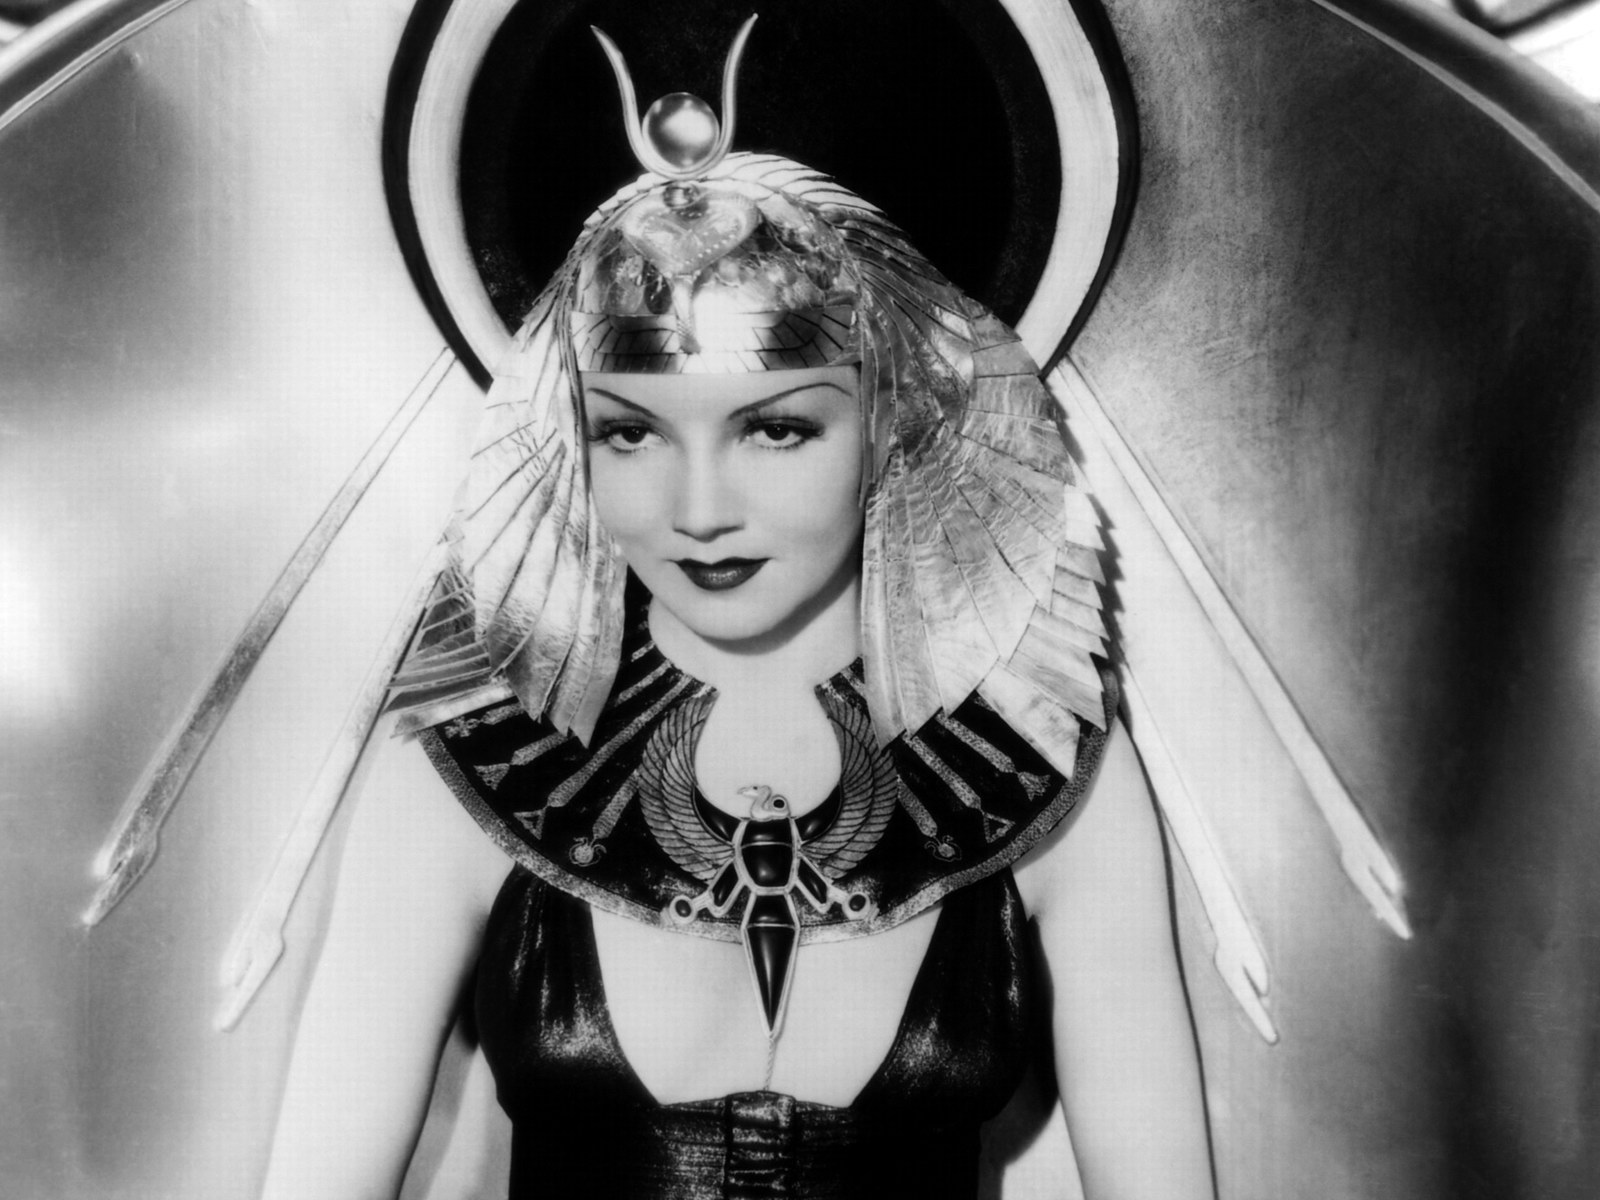 Клеопатра, Cleopatra, фильм, кино фото.